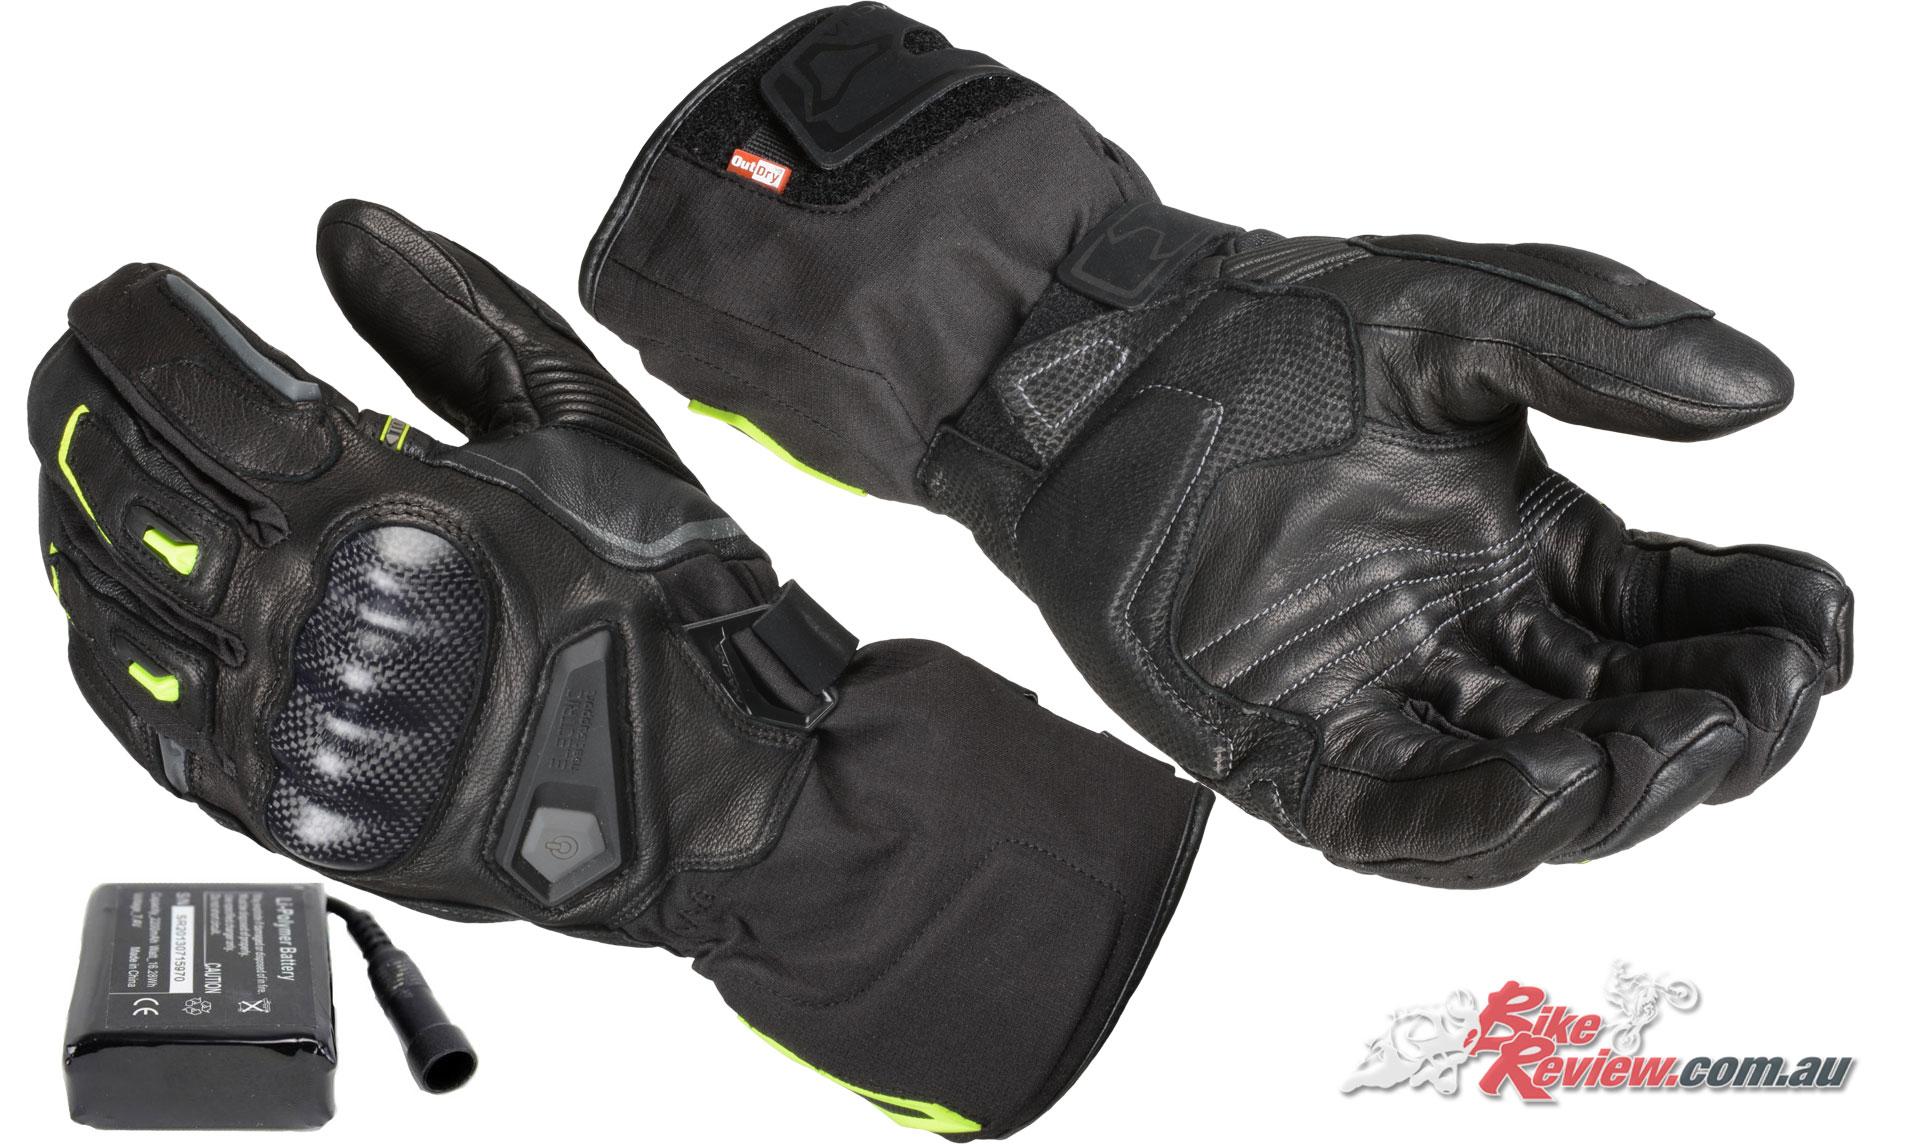 Macna Neutron Gloves - $399.95 RRP